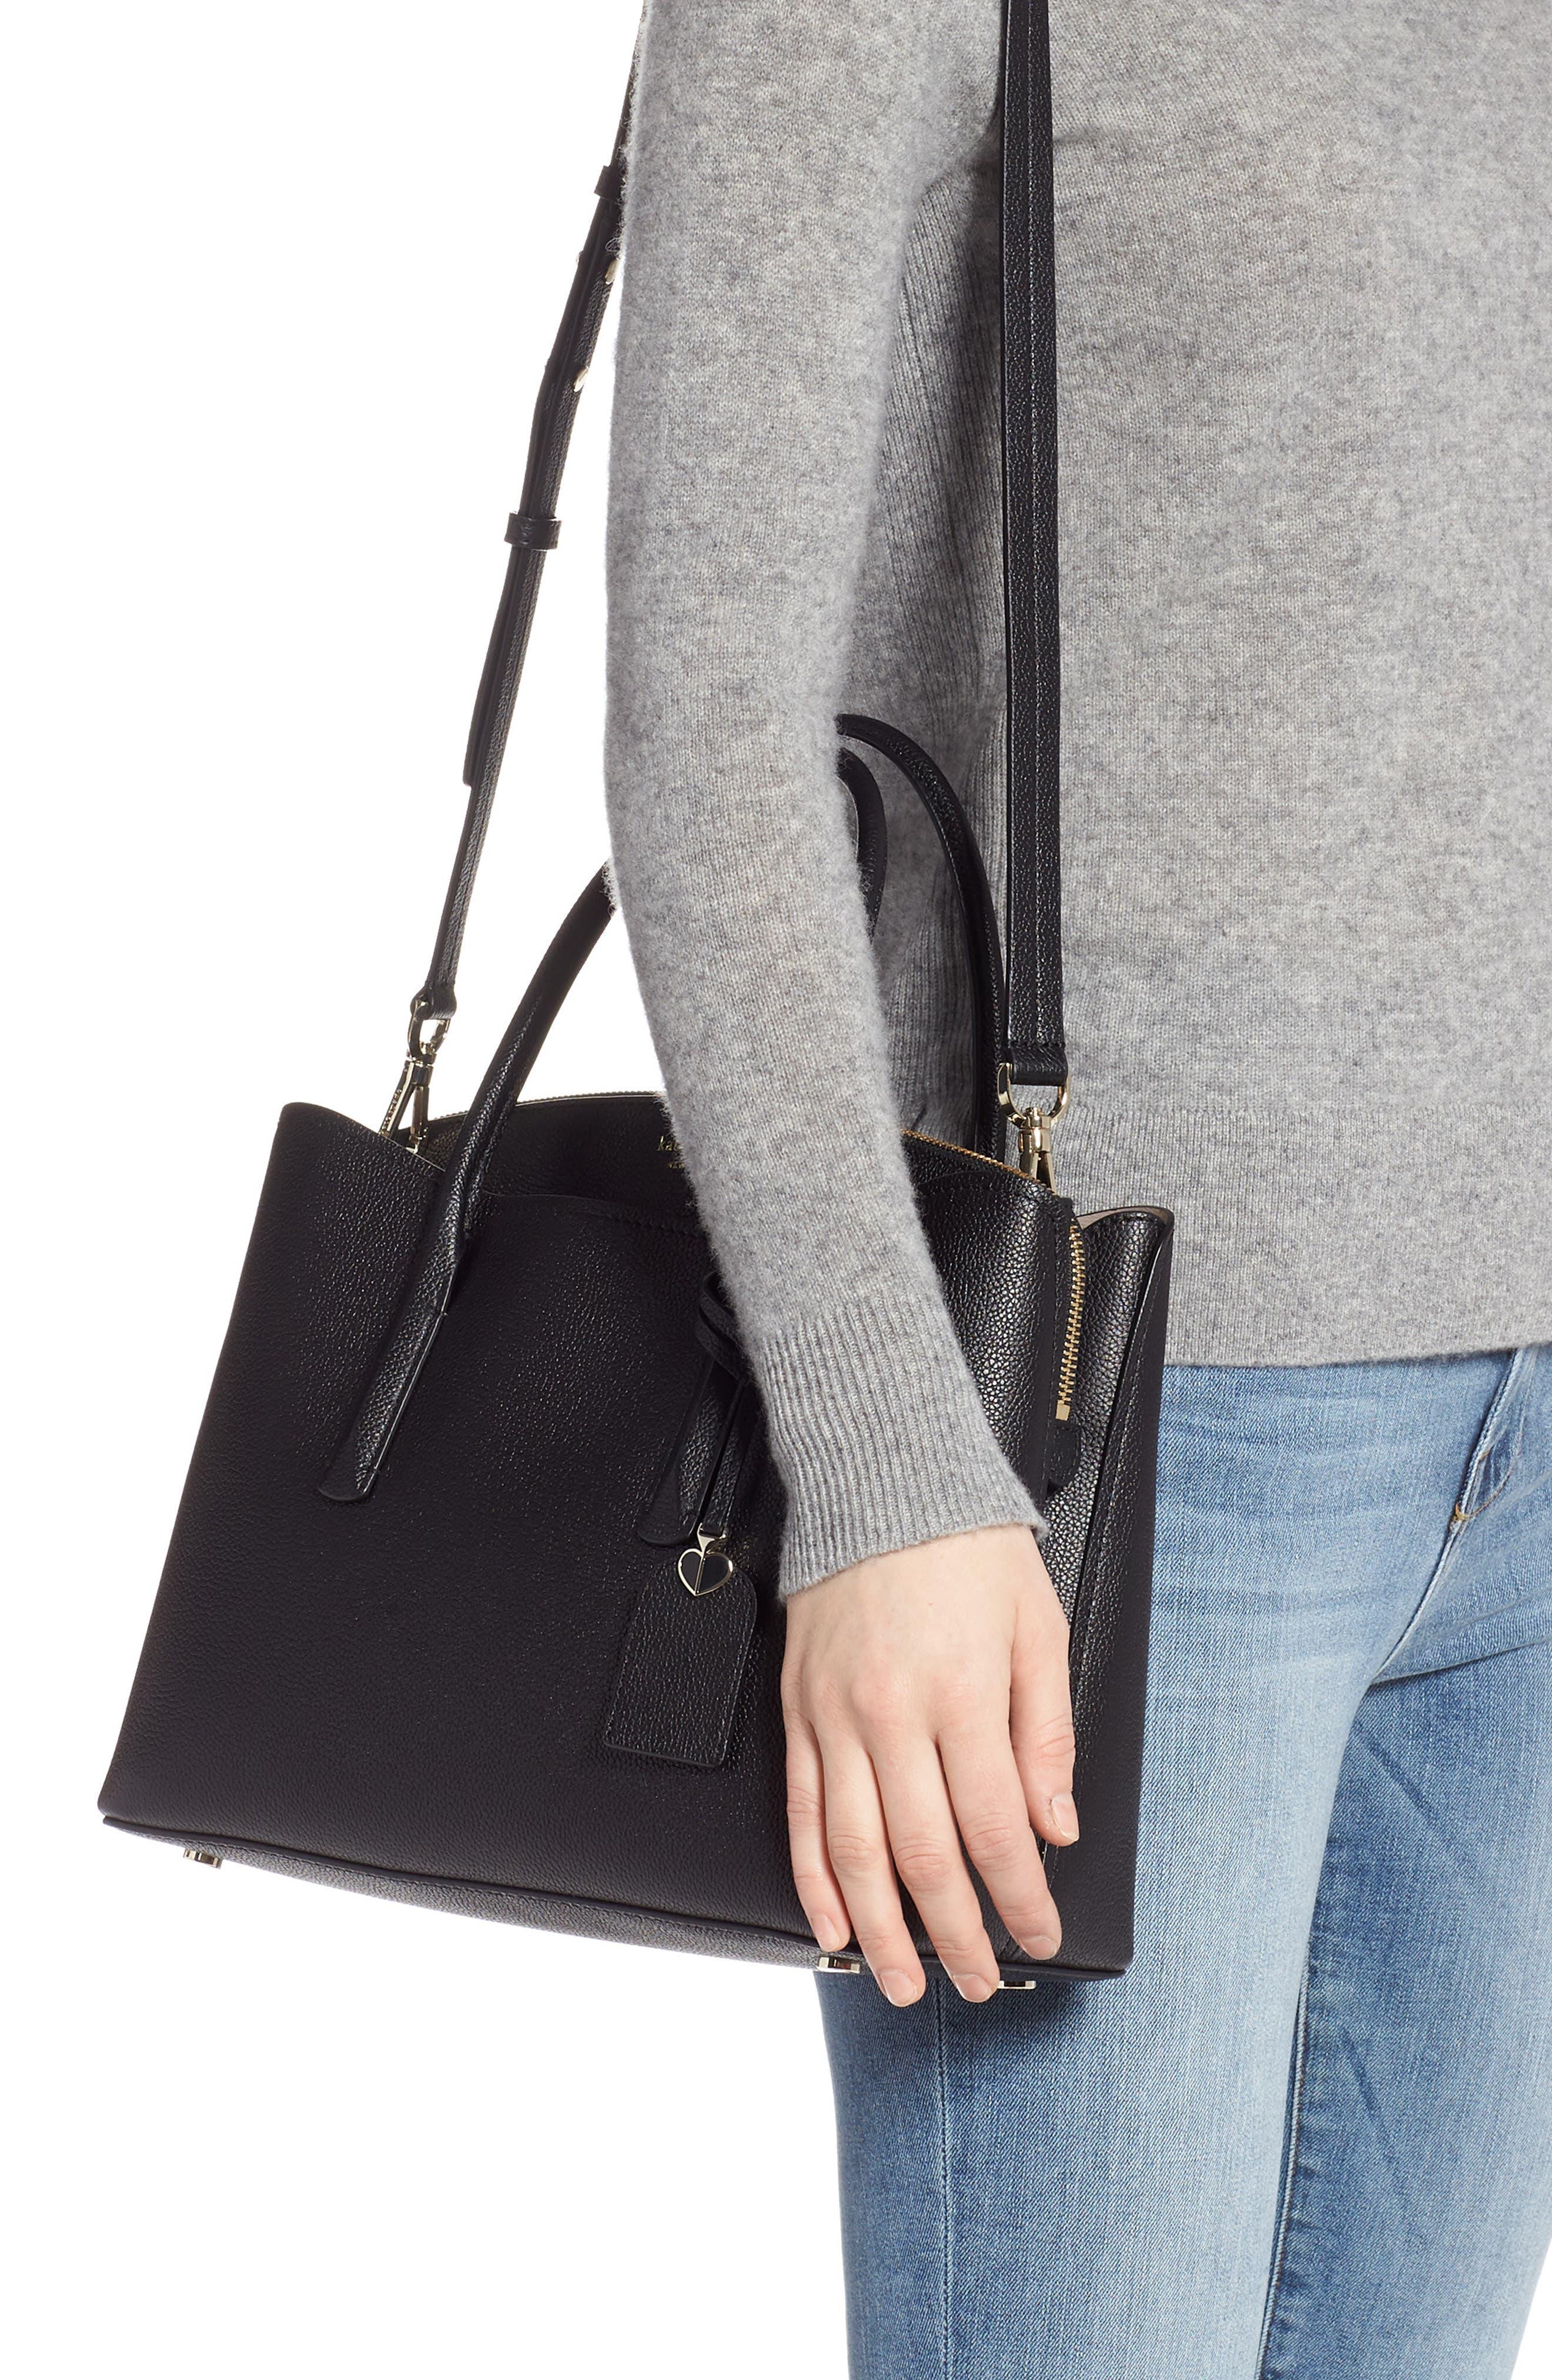 KATE SPADE NEW YORK,                             large margaux leather satchel,                             Alternate thumbnail 2, color,                             BLACK